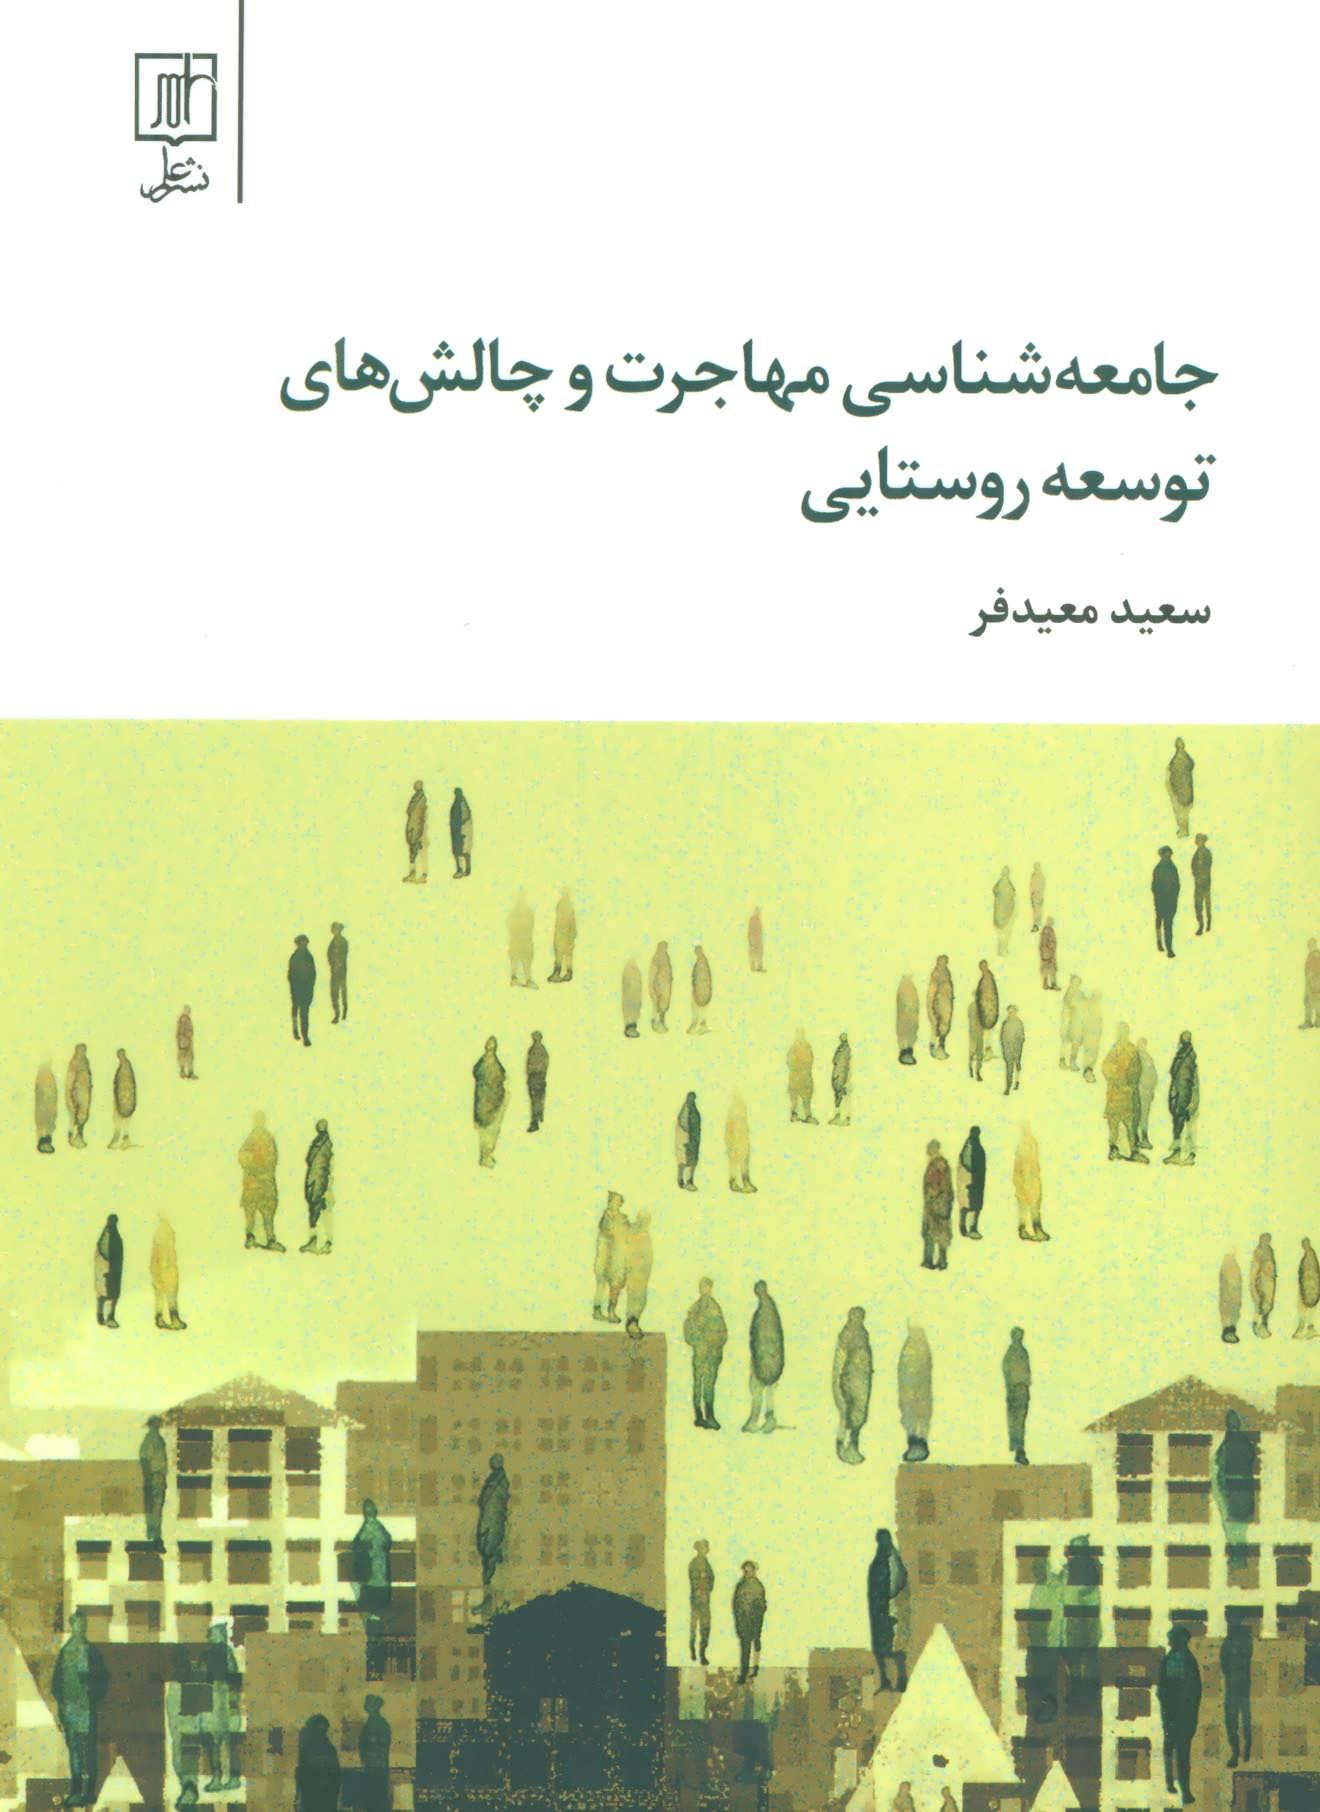 جامعه شناسي مهاجرت و چالش هاي توسعه روستايي